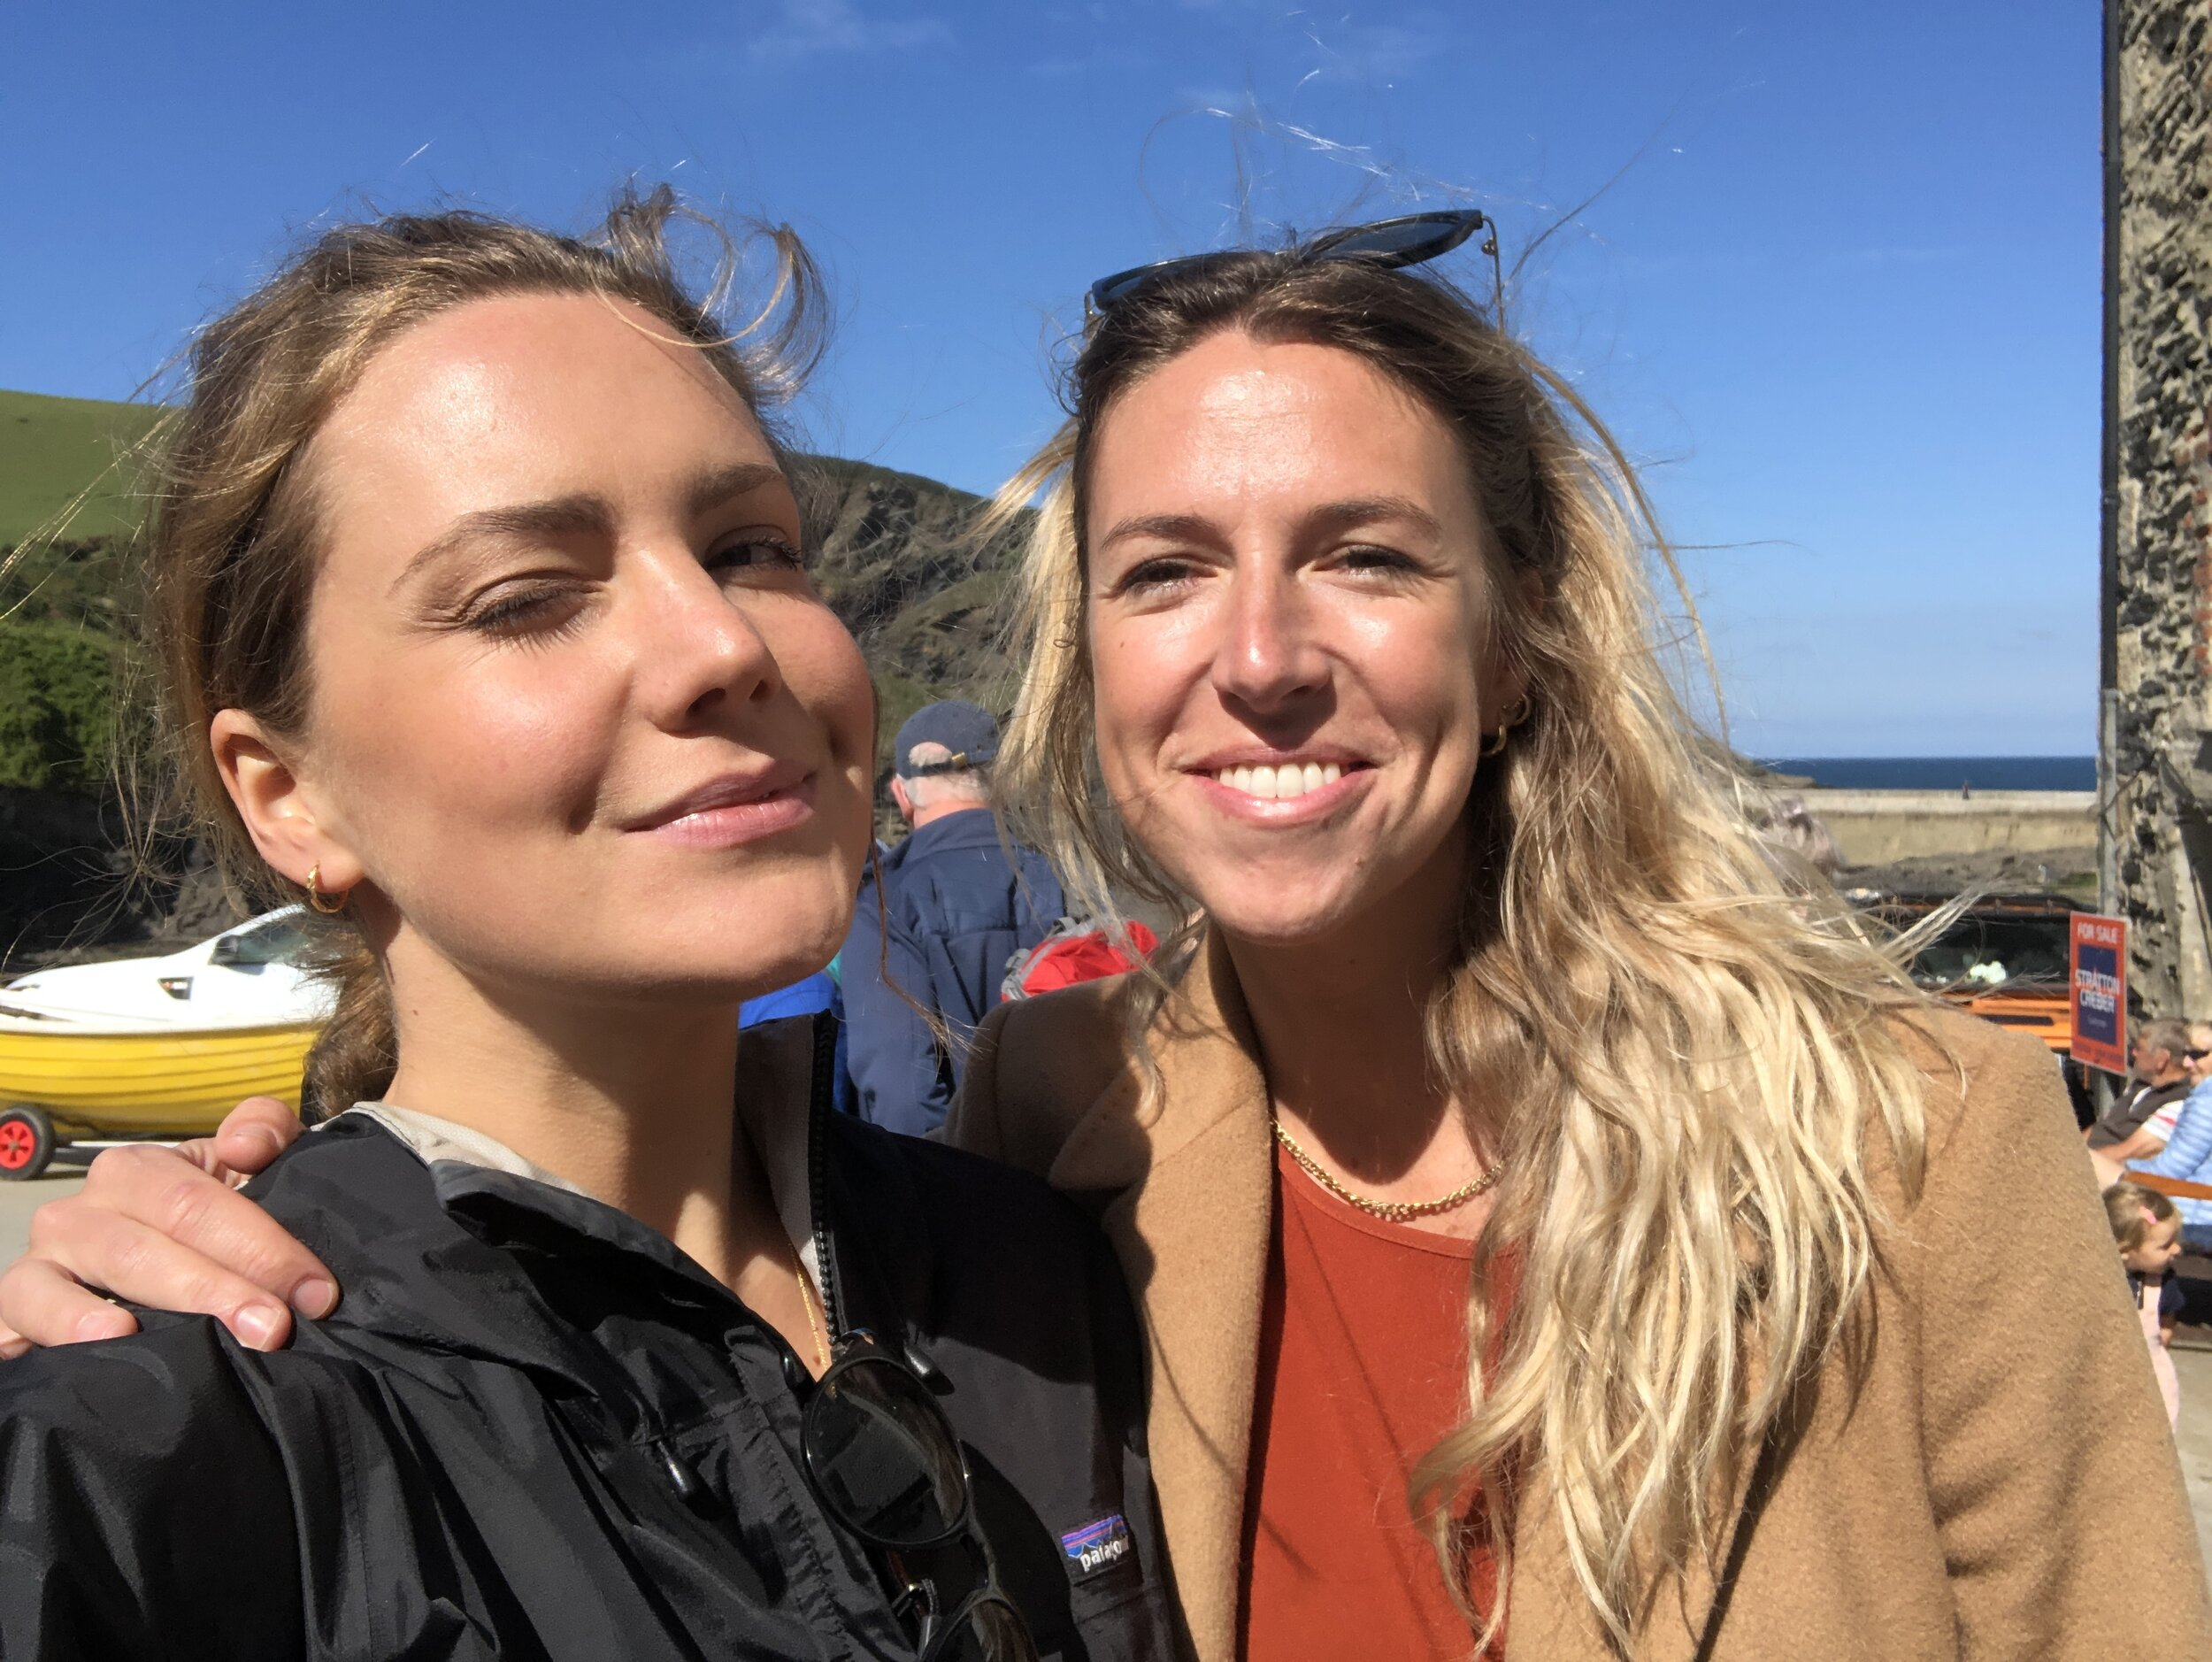 Katy and I, having pint of Doom Bar on the slipway in Port Issac - holiday heaven.